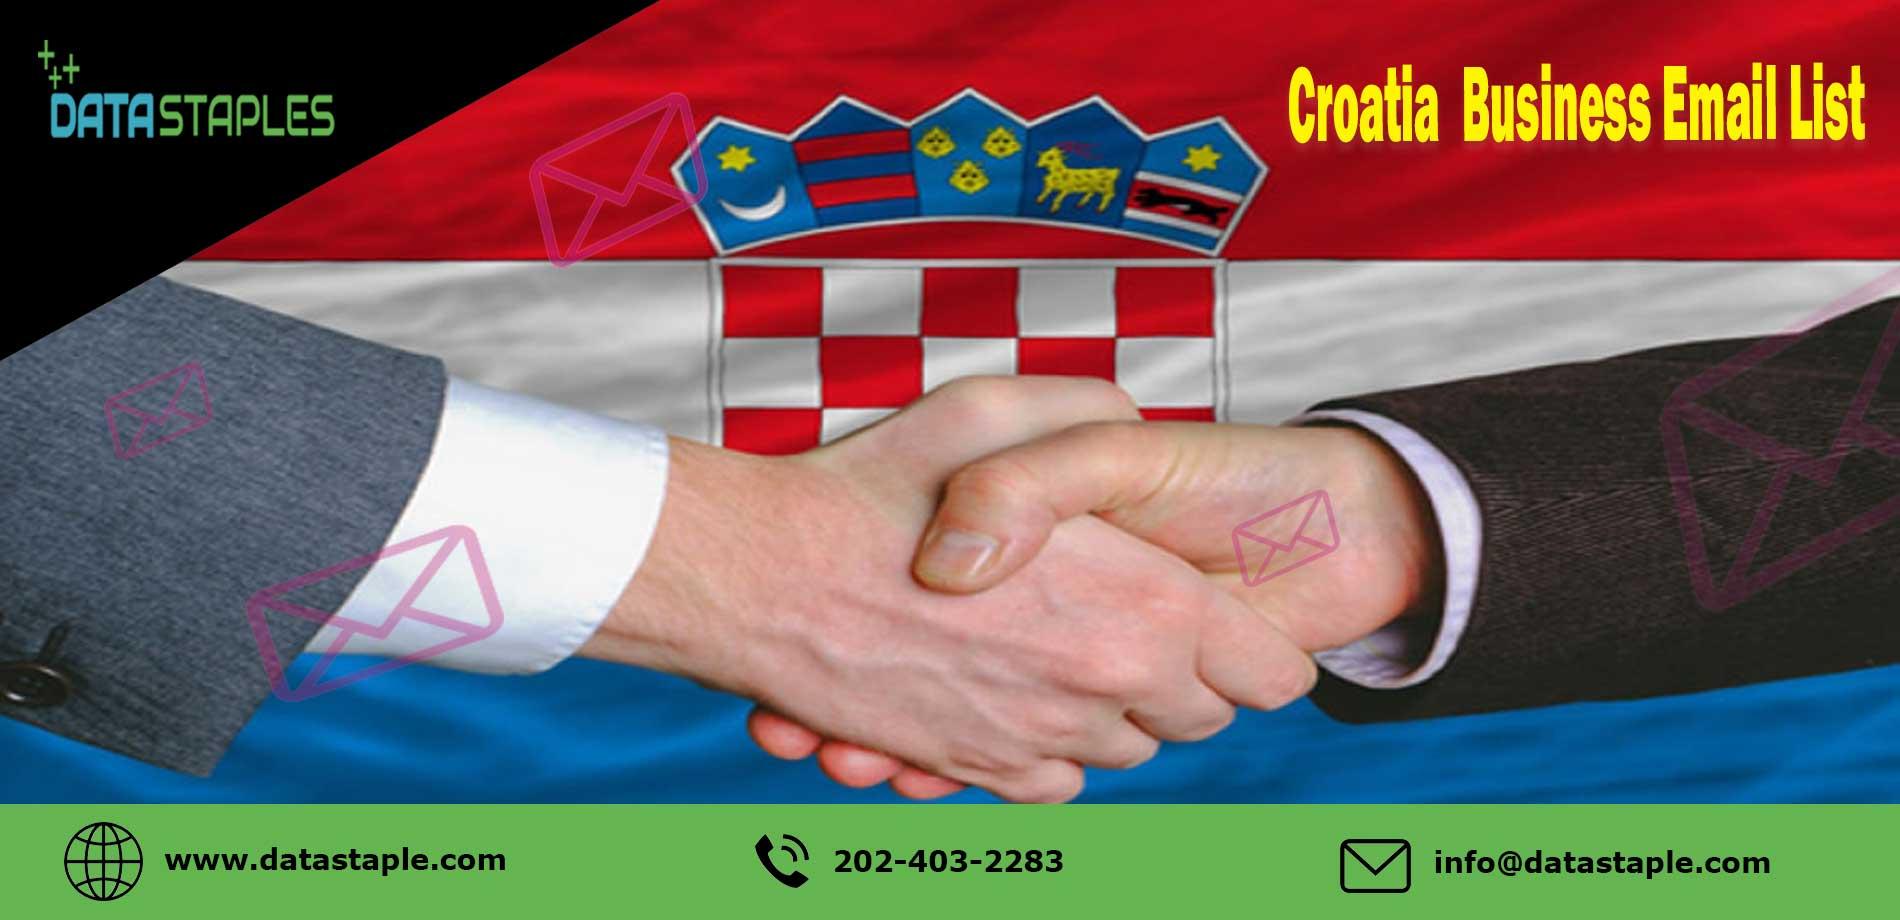 Croatia Business Email List | DataStaples